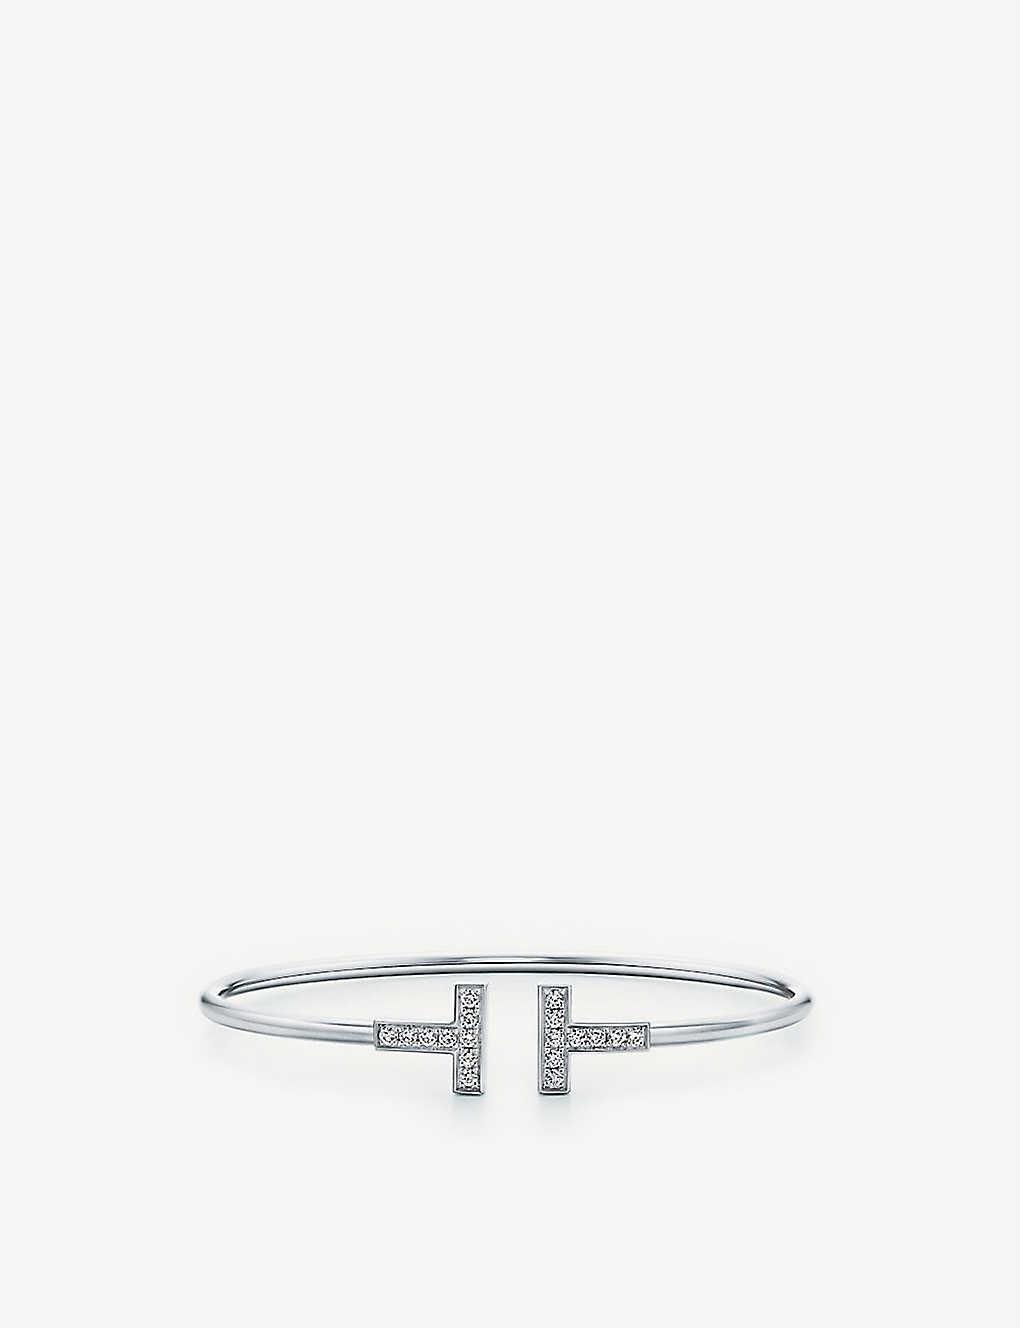 690b0cce5 TIFFANY & CO Tiffany T wire bracelet in 18k white gold with diamonds